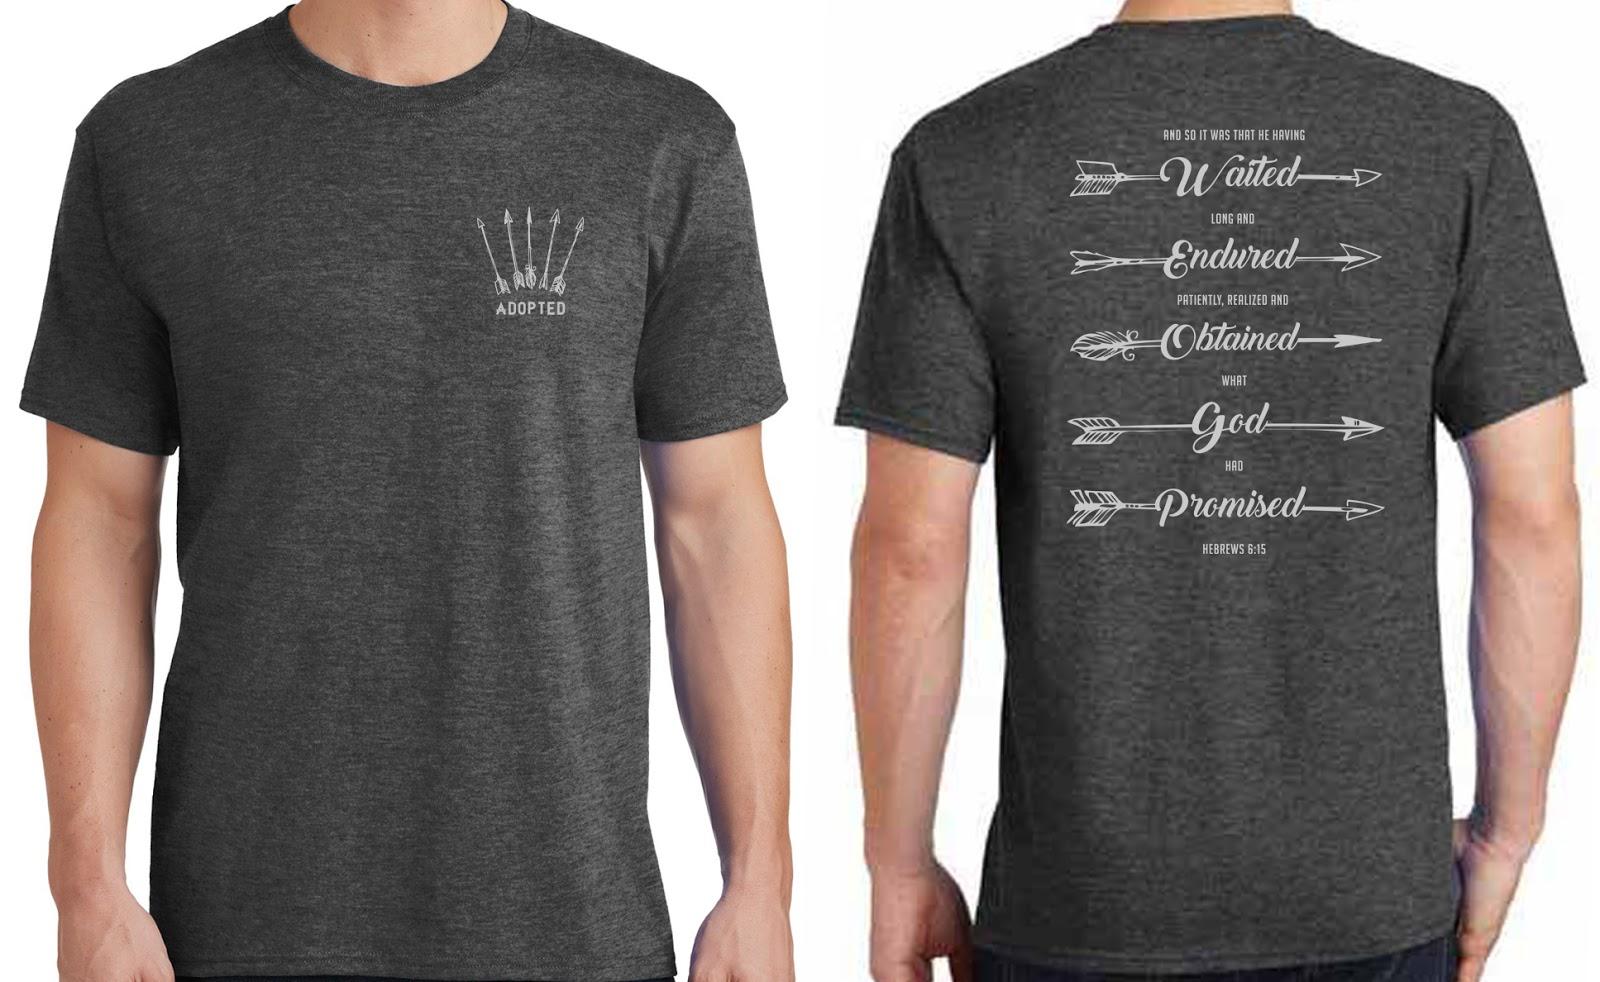 Carroll crew for Adoption fundraiser t shirts